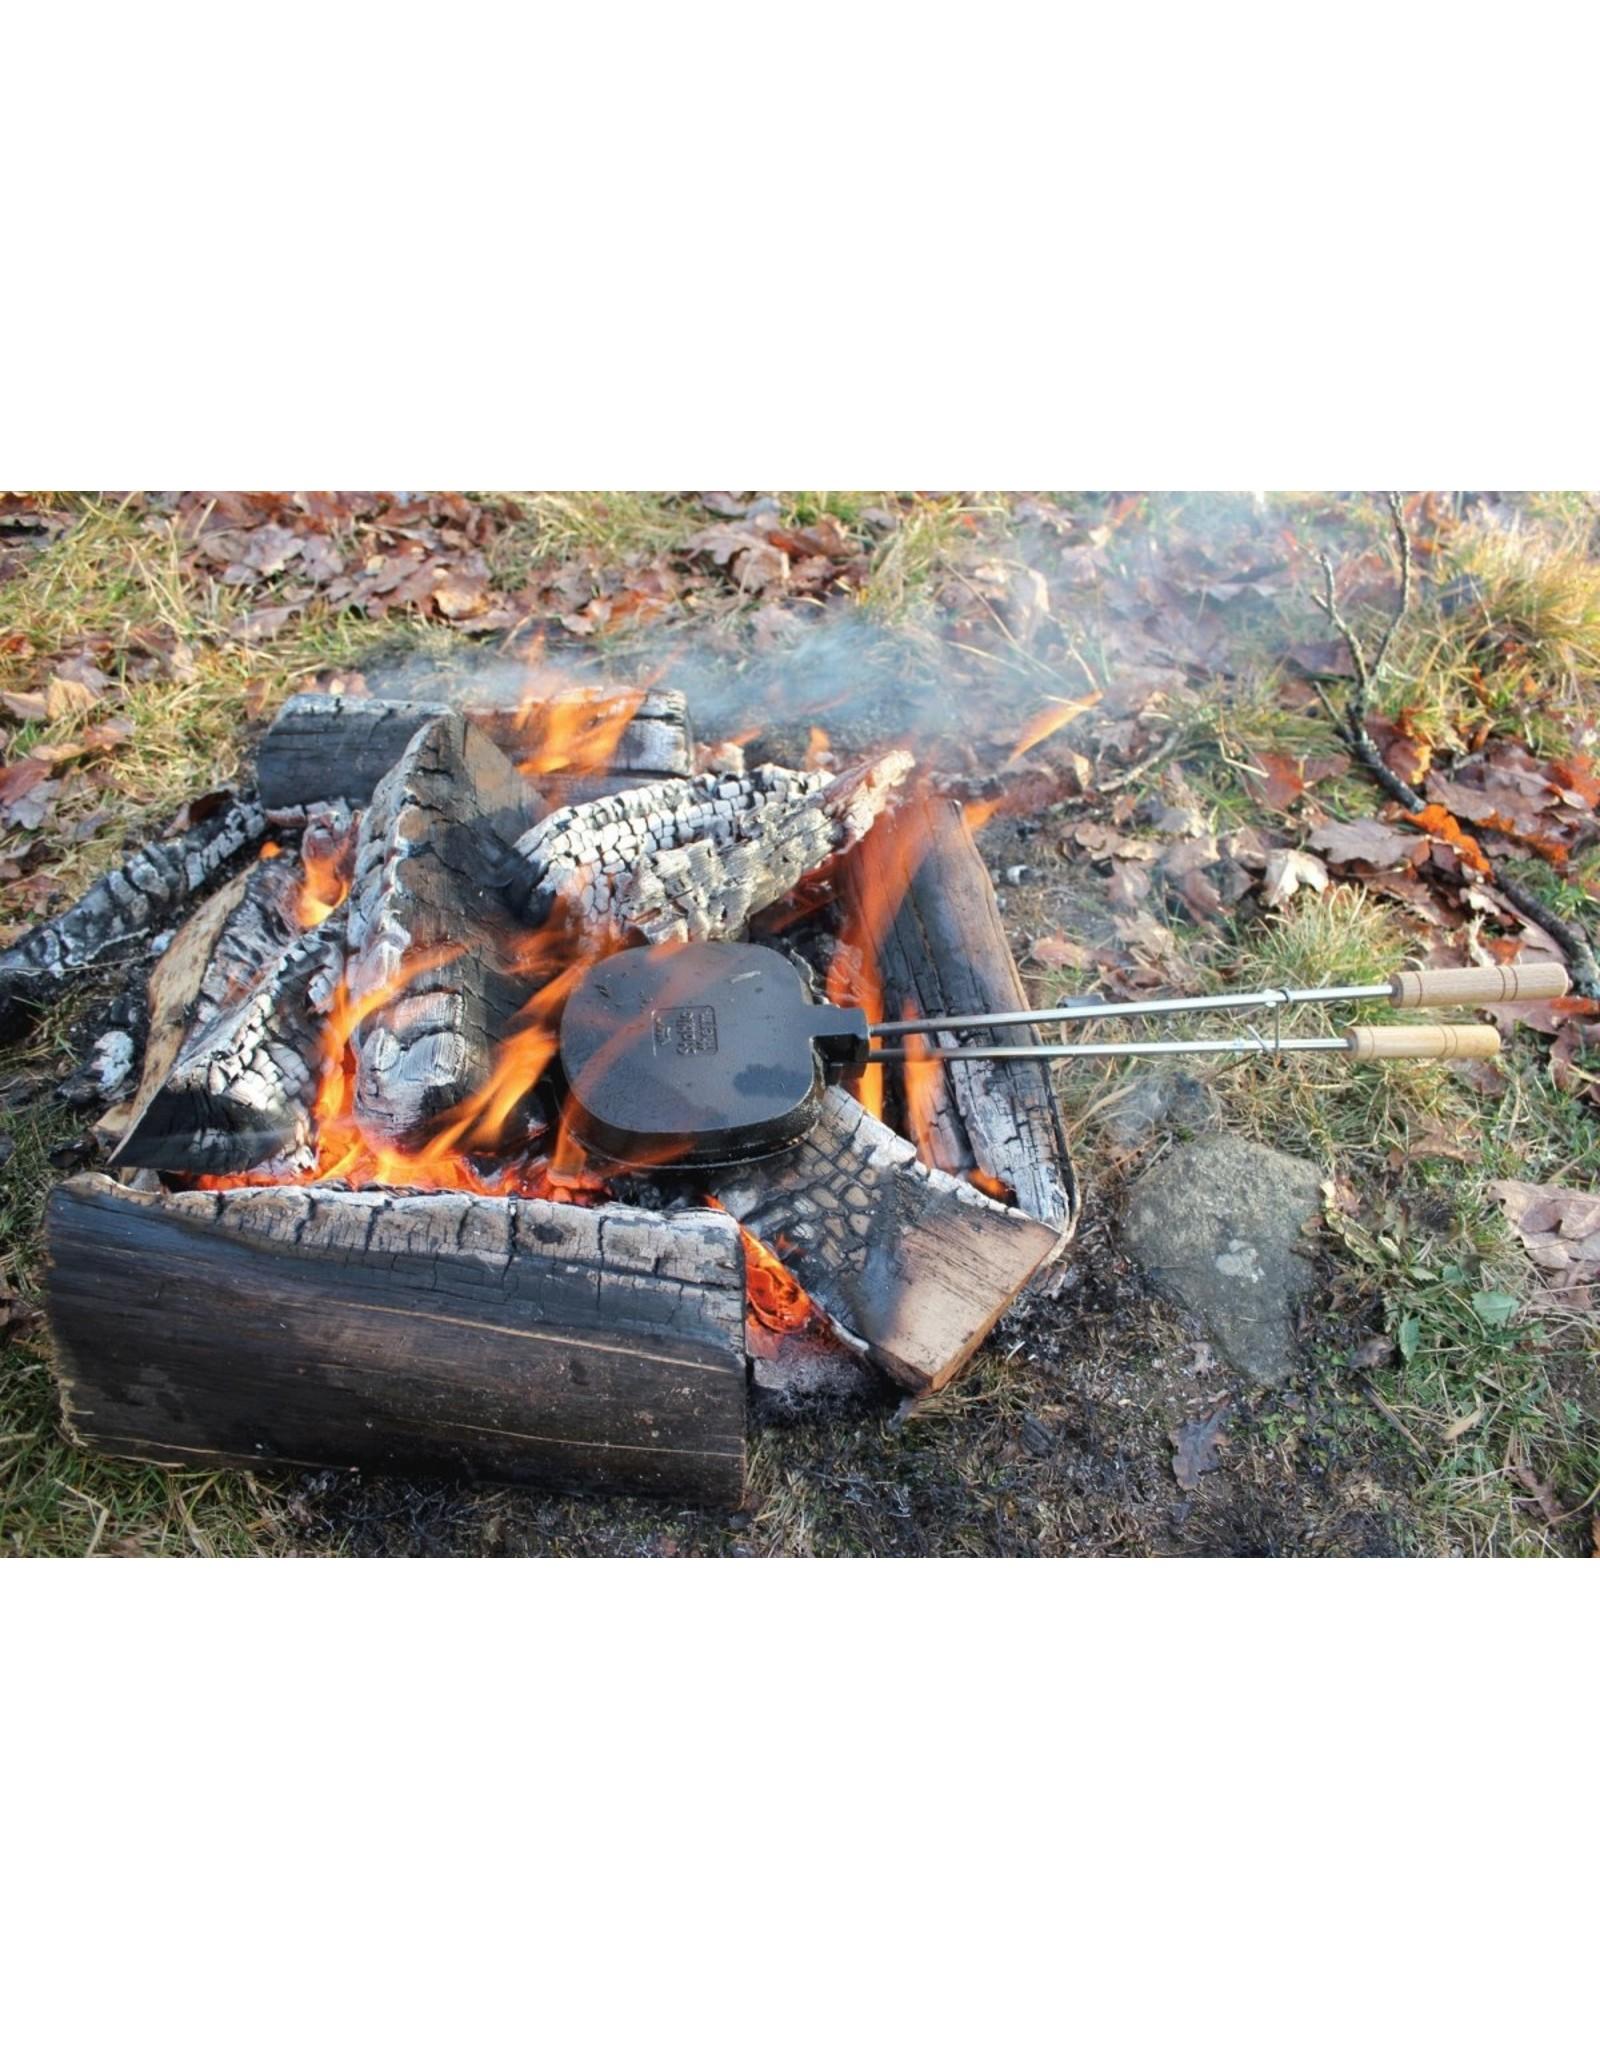 Stabilotherm Stabilotherm Sandwich Iron Moose Motif